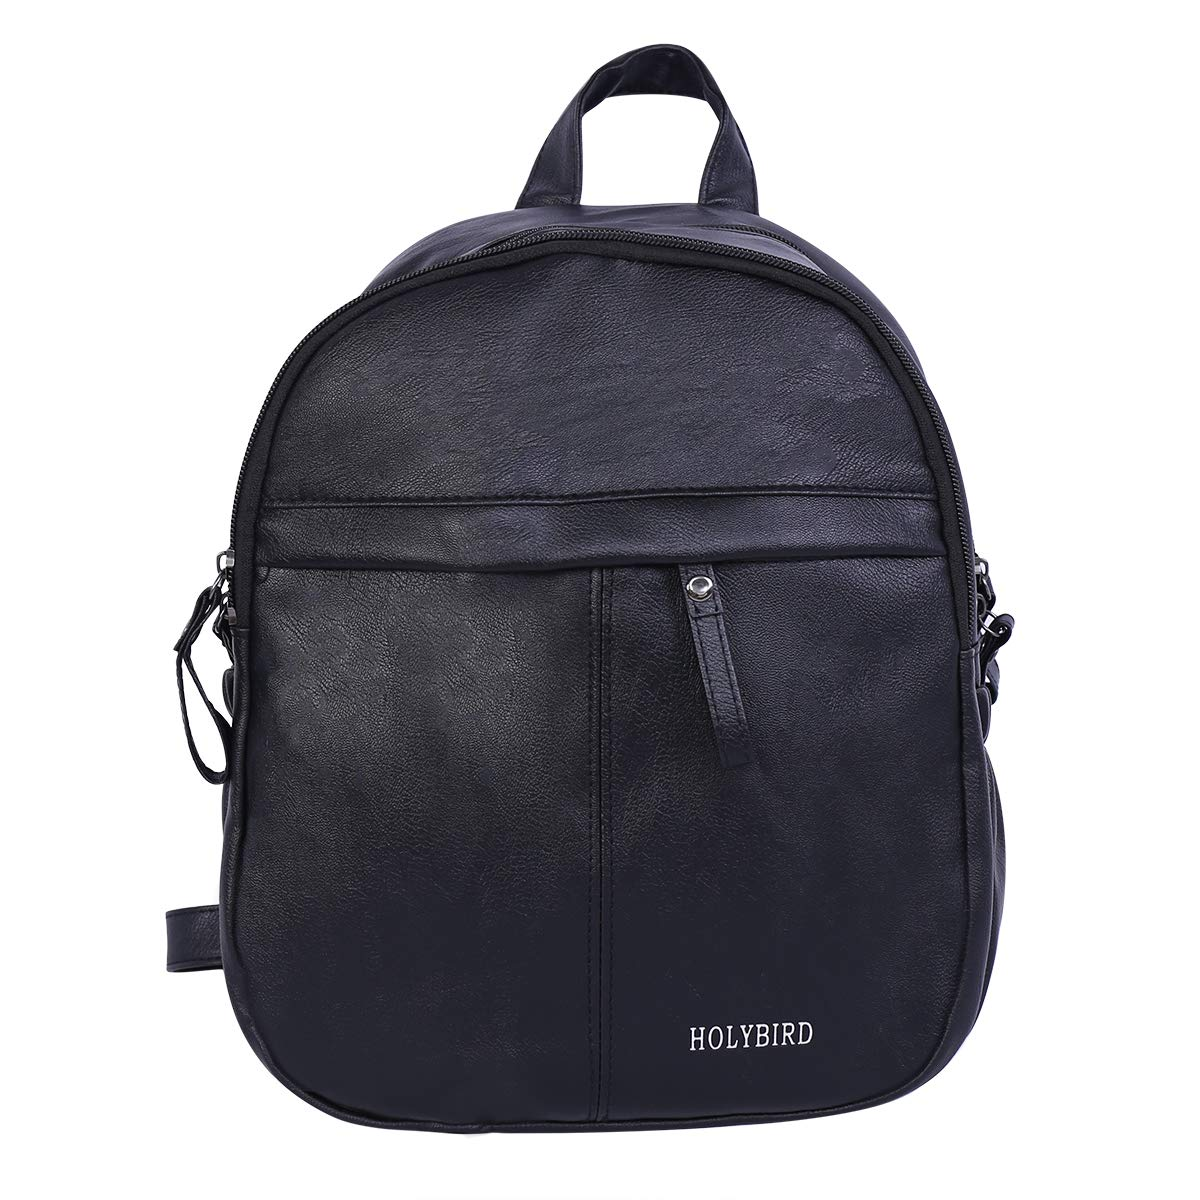 Black1 HOLYBIRD Waterproof Backpack PU Leather Mini Women Purse for School Shopping Dating